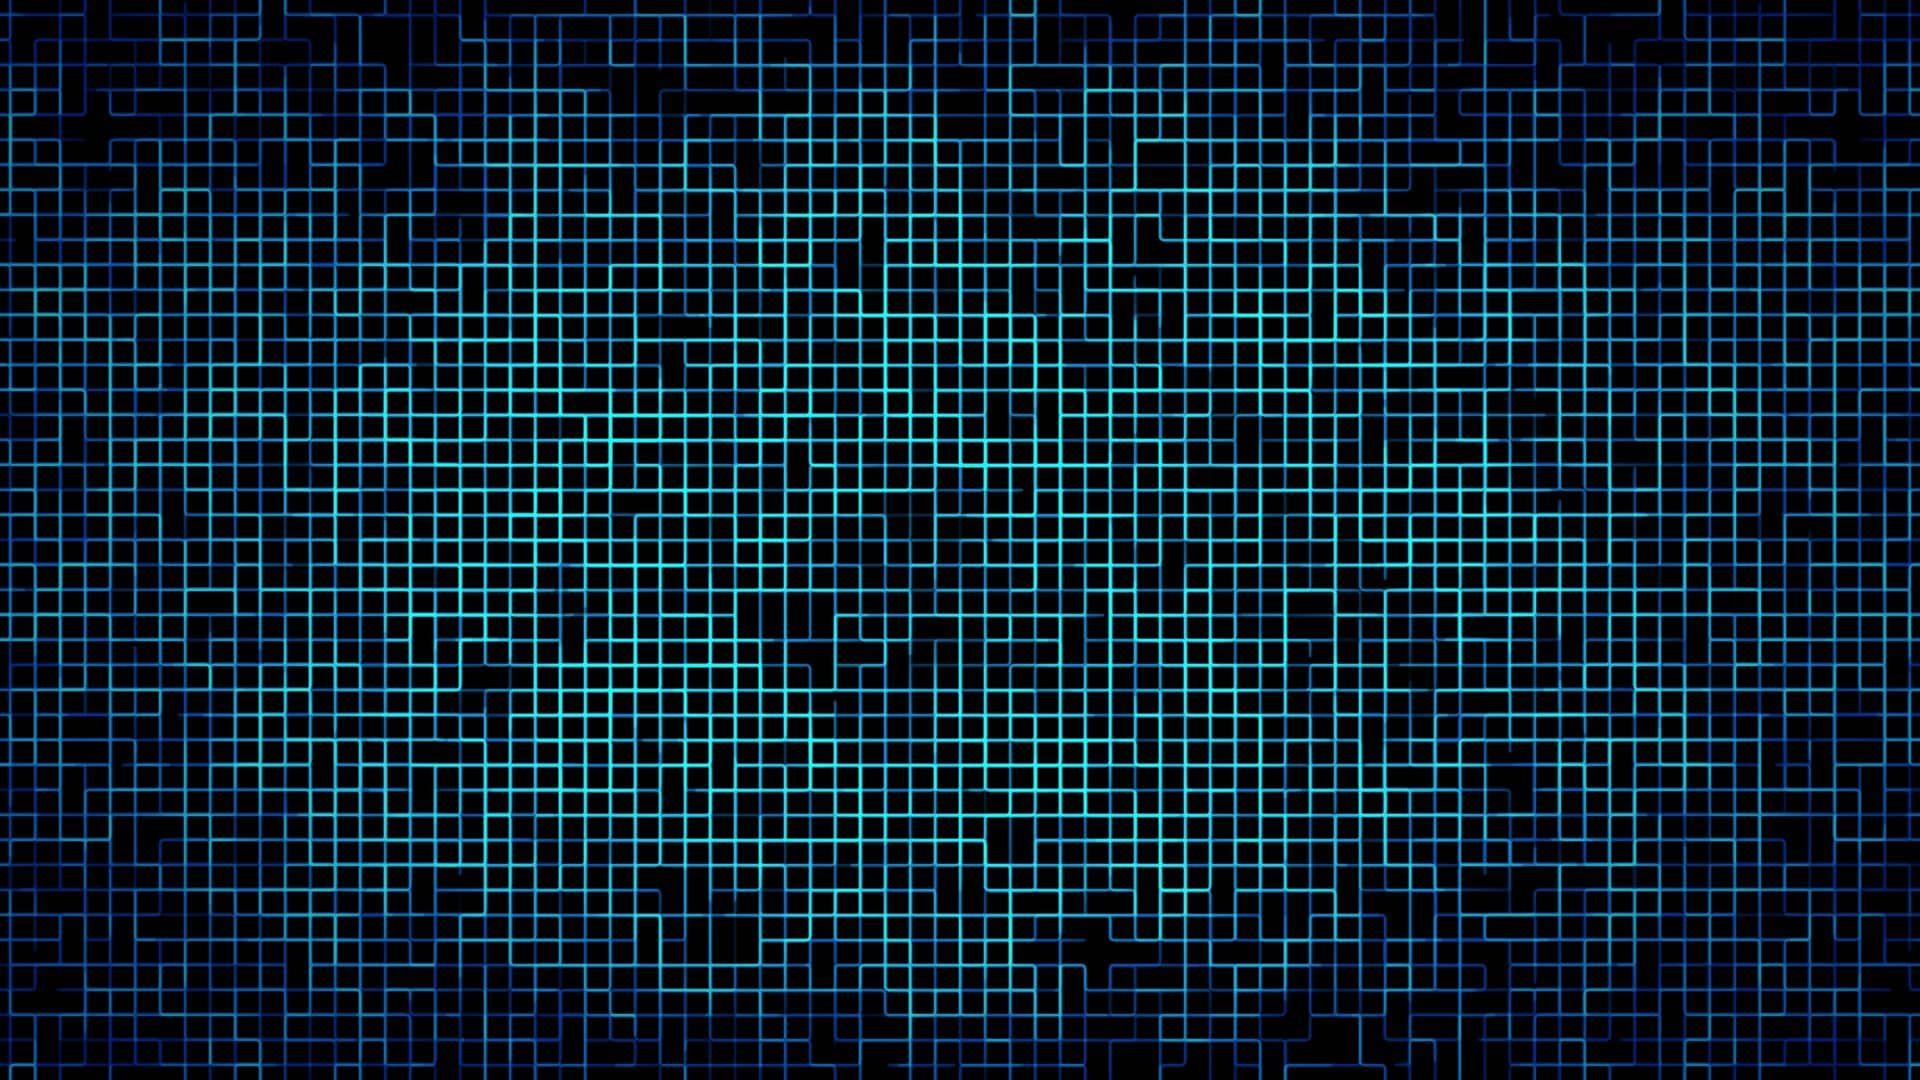 Grid 3008 HD, 4K Stock Video https://vimeo.com/205663956